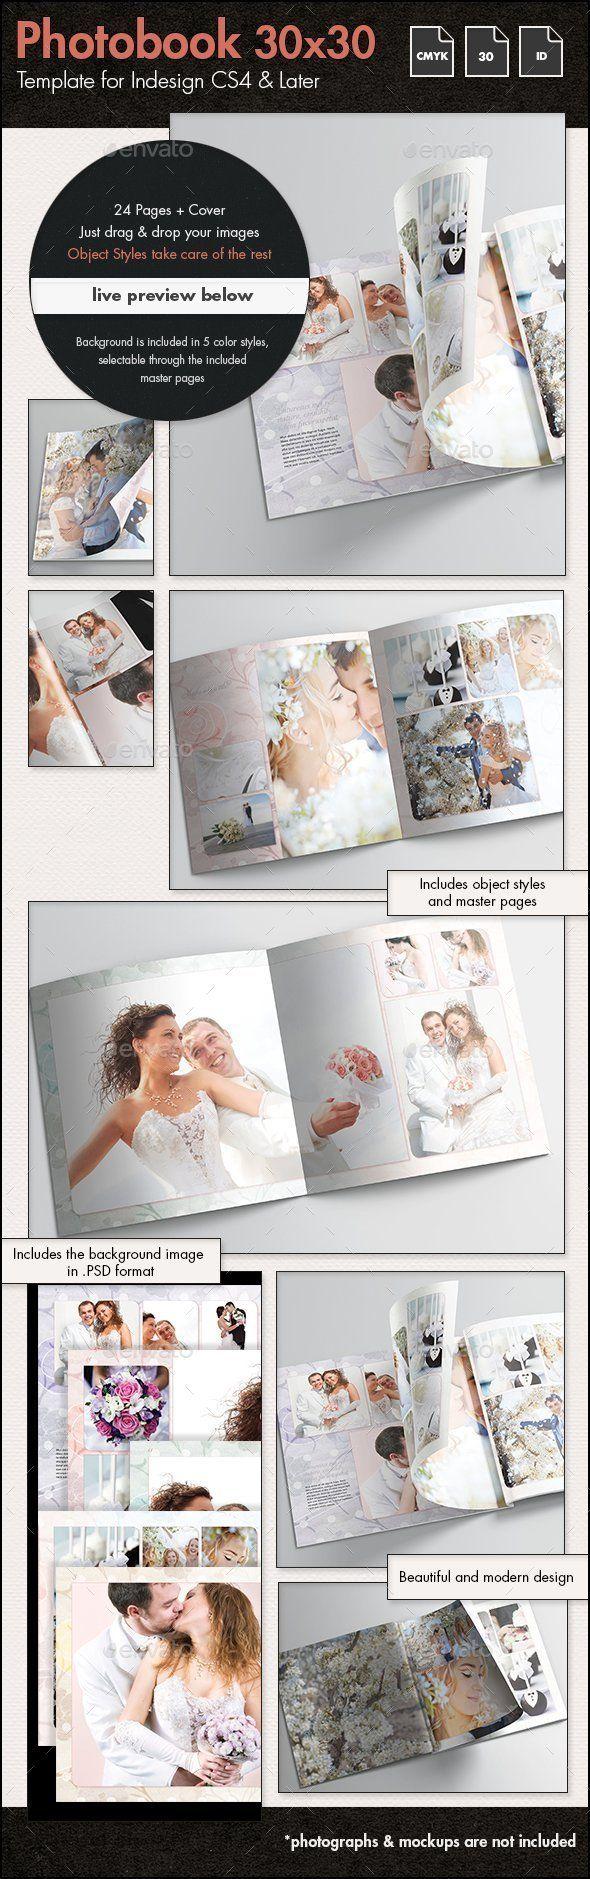 Photobook Wedding Album Template - 30x30cm